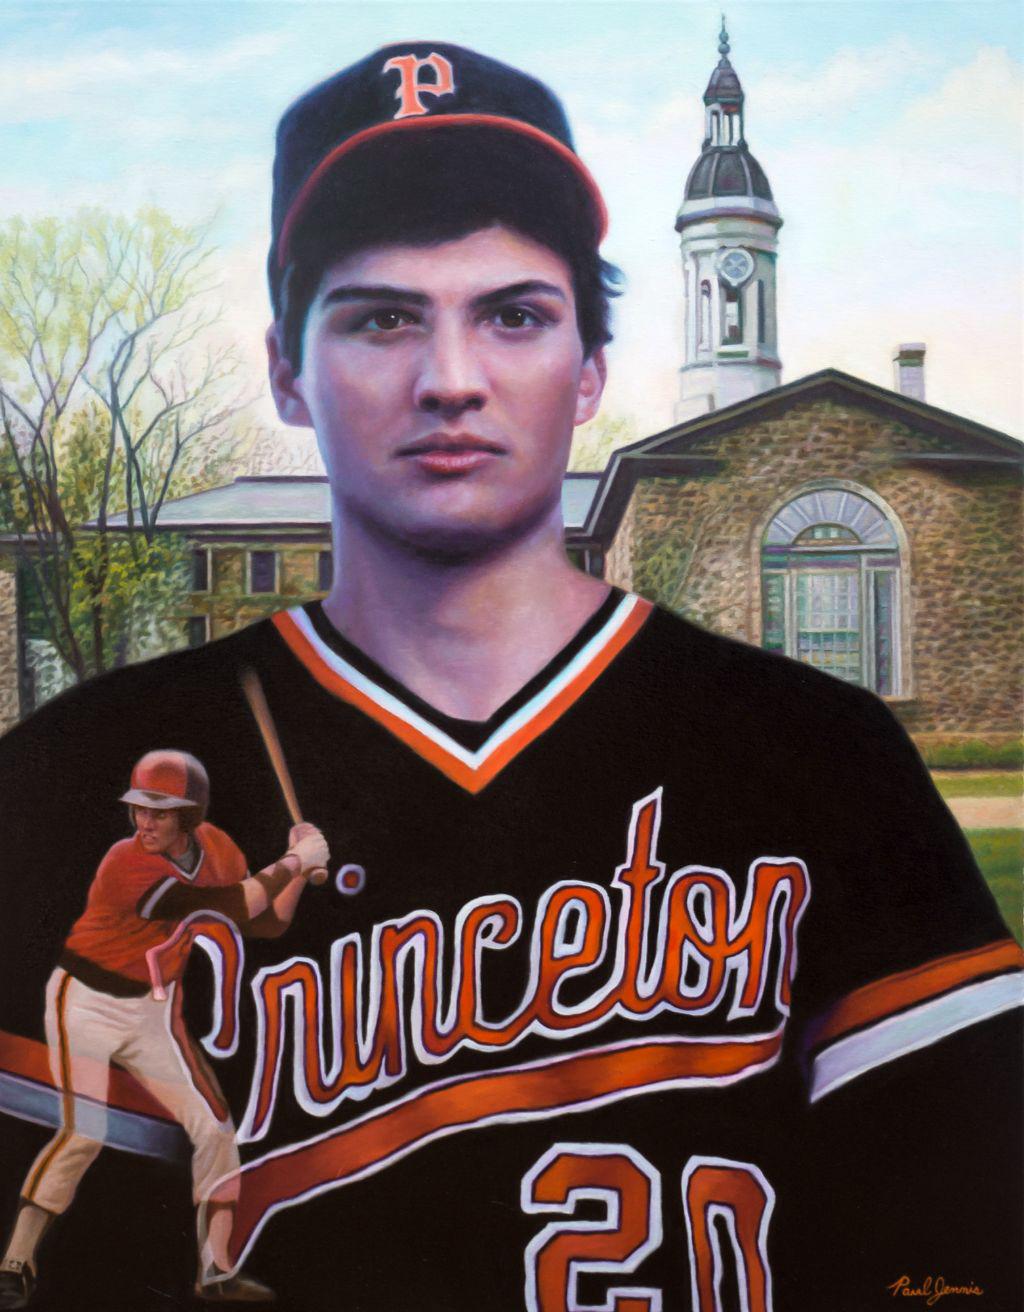 Princeton baseball player Dan Arendas